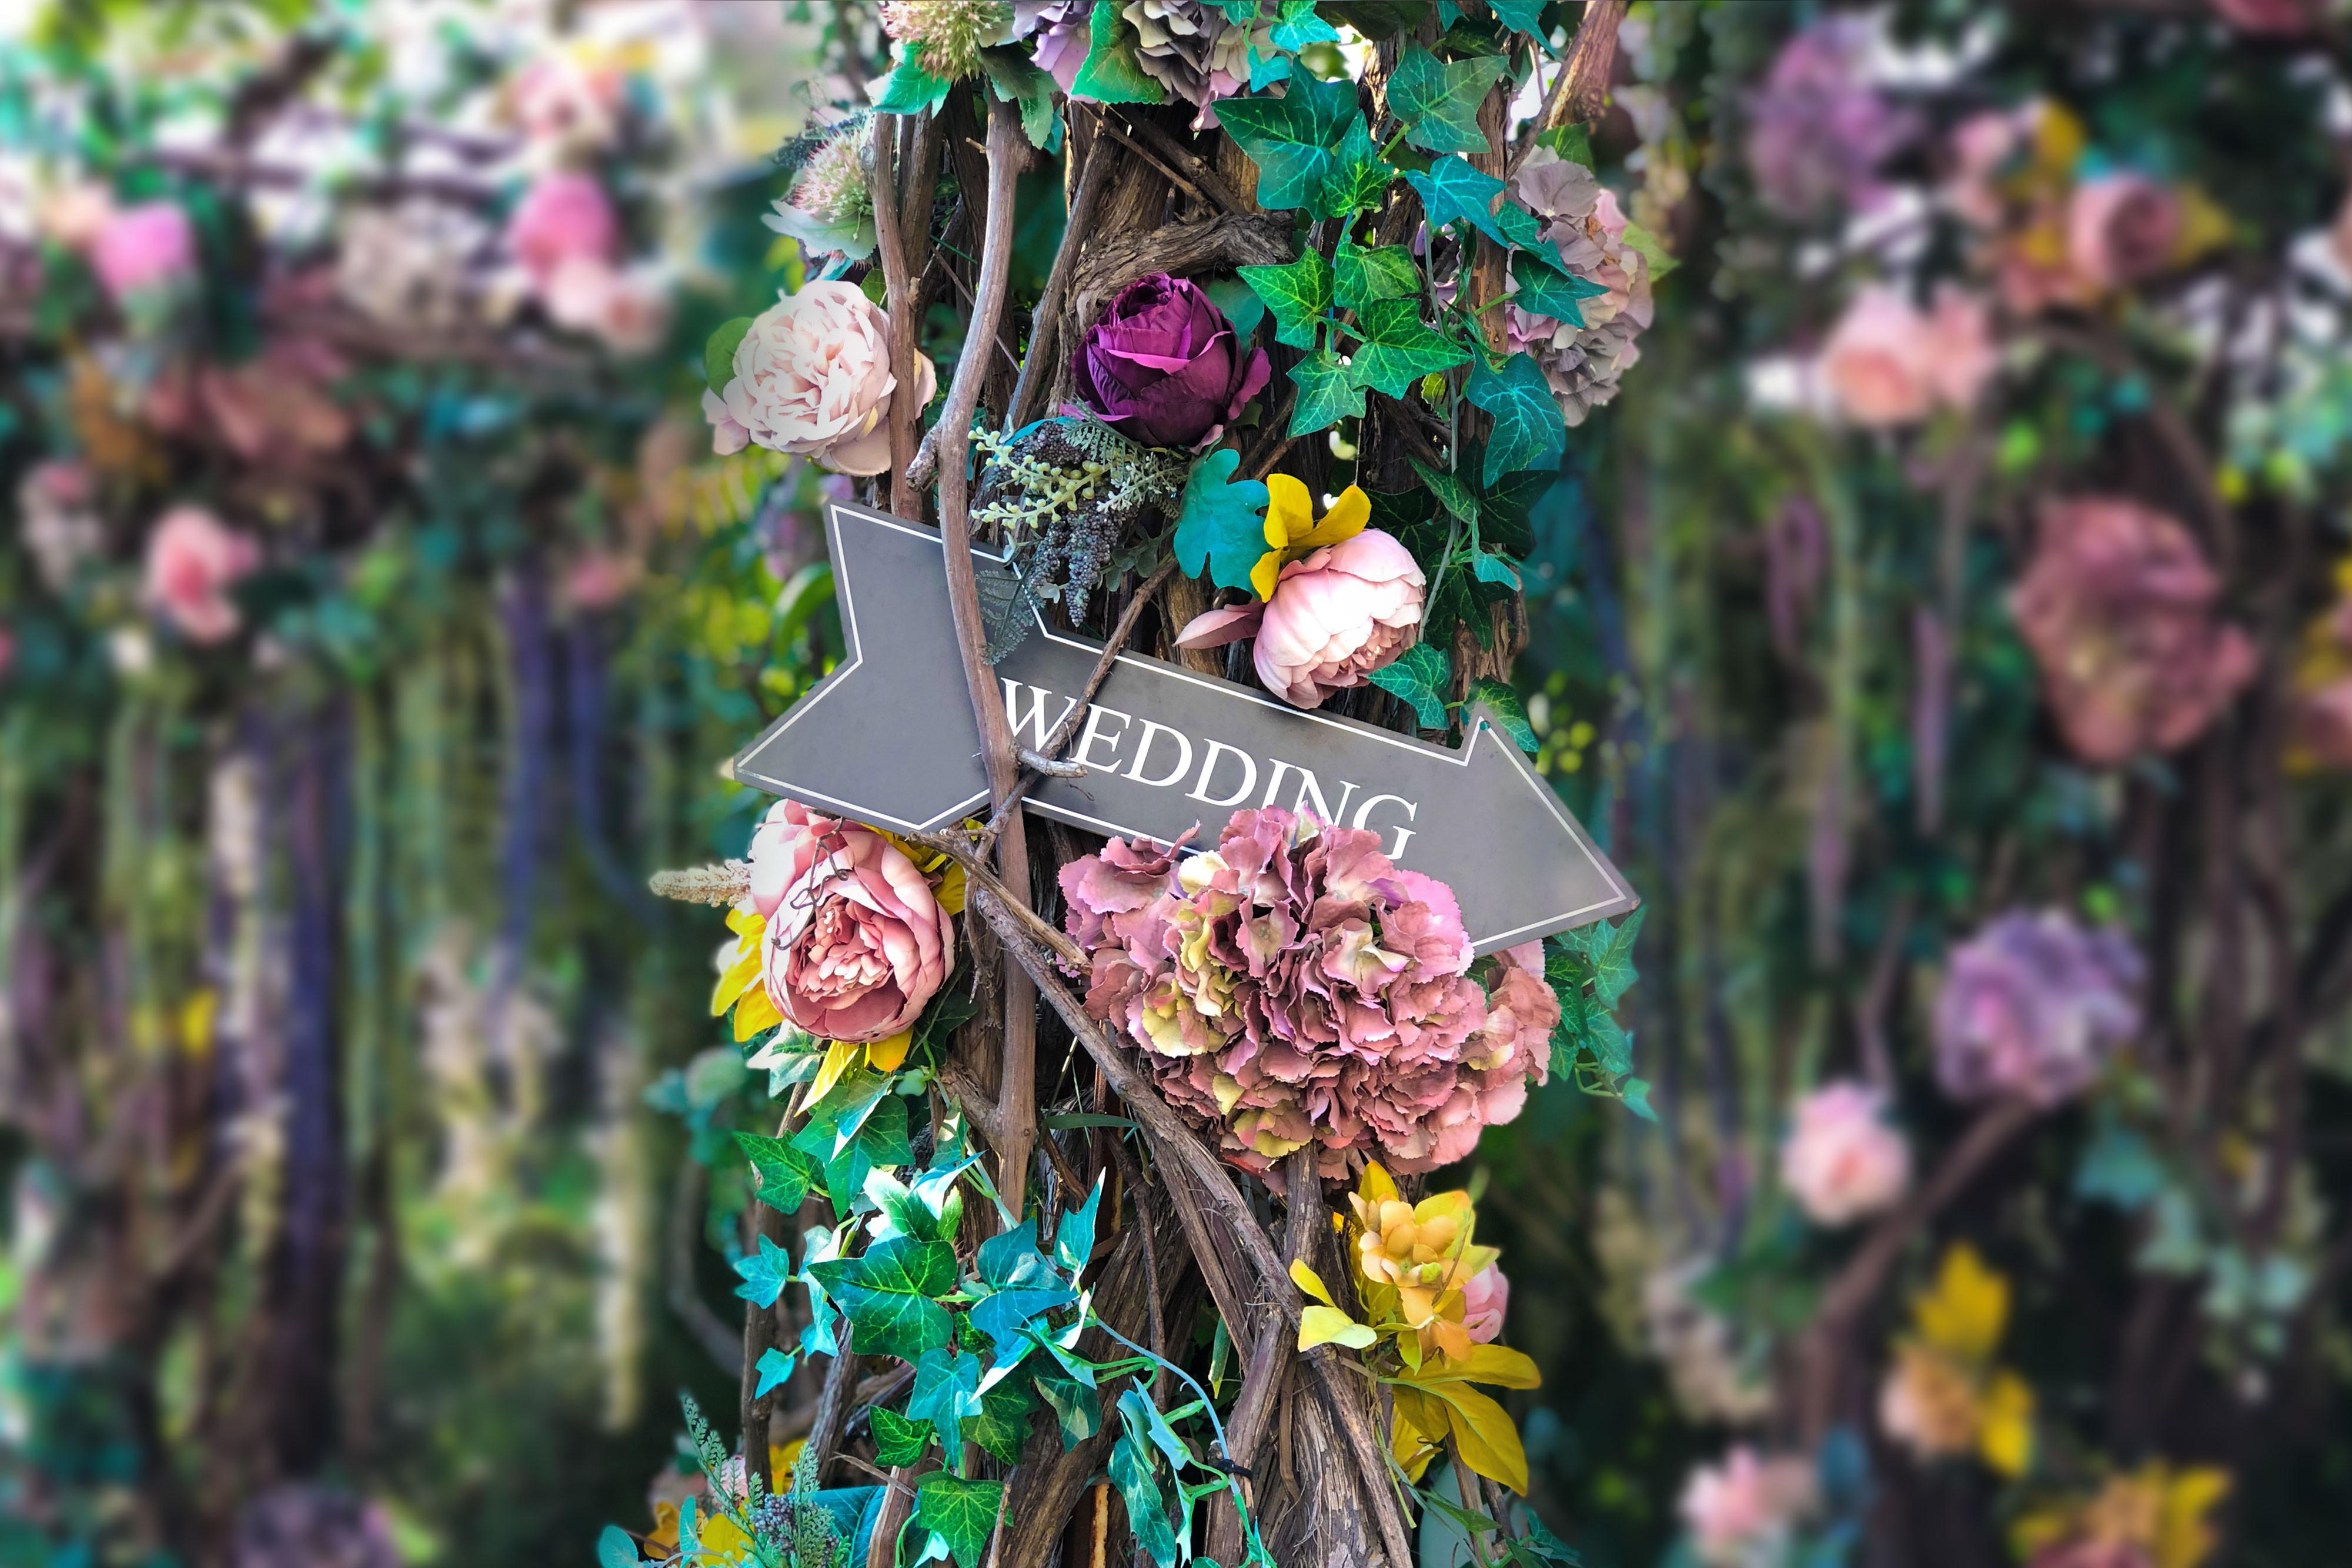 Gatlinburg Tennessee Wedding Packages | Westgate Wedding Venue In Tennessee